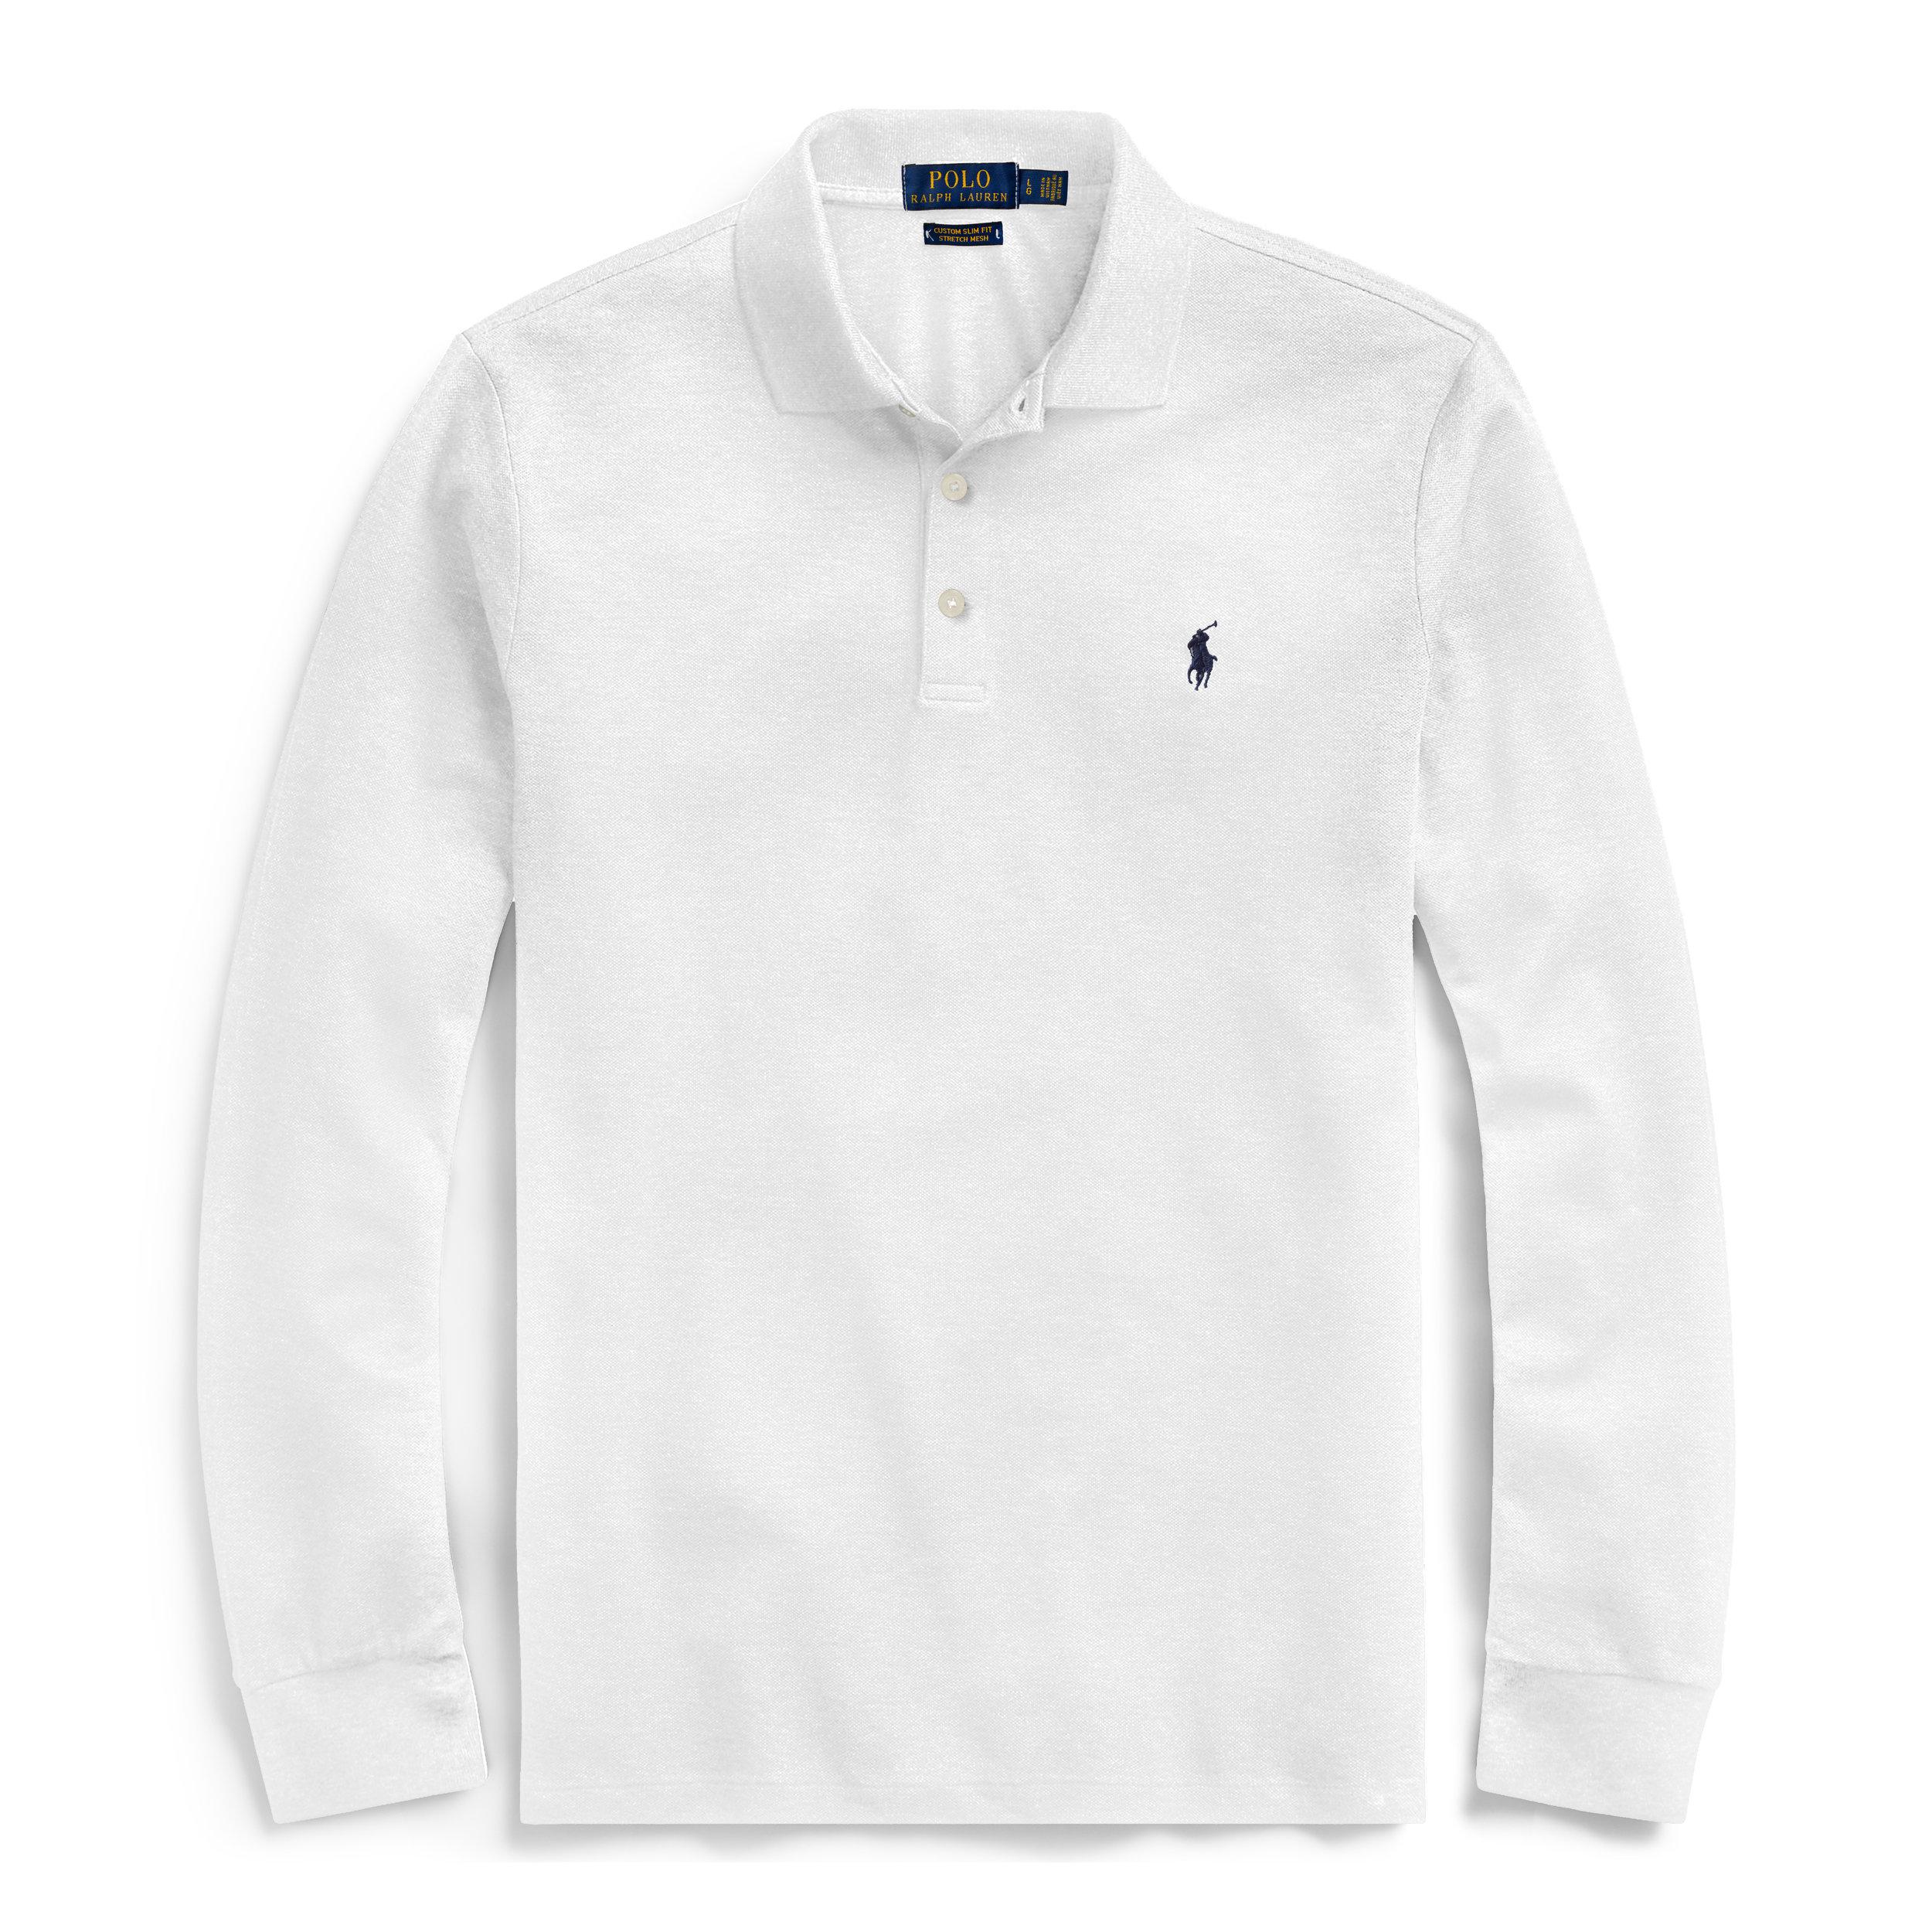 peculiare rifiuto In particolare  long sleeve polo collared shirt - 56% OFF - tajpalace.net